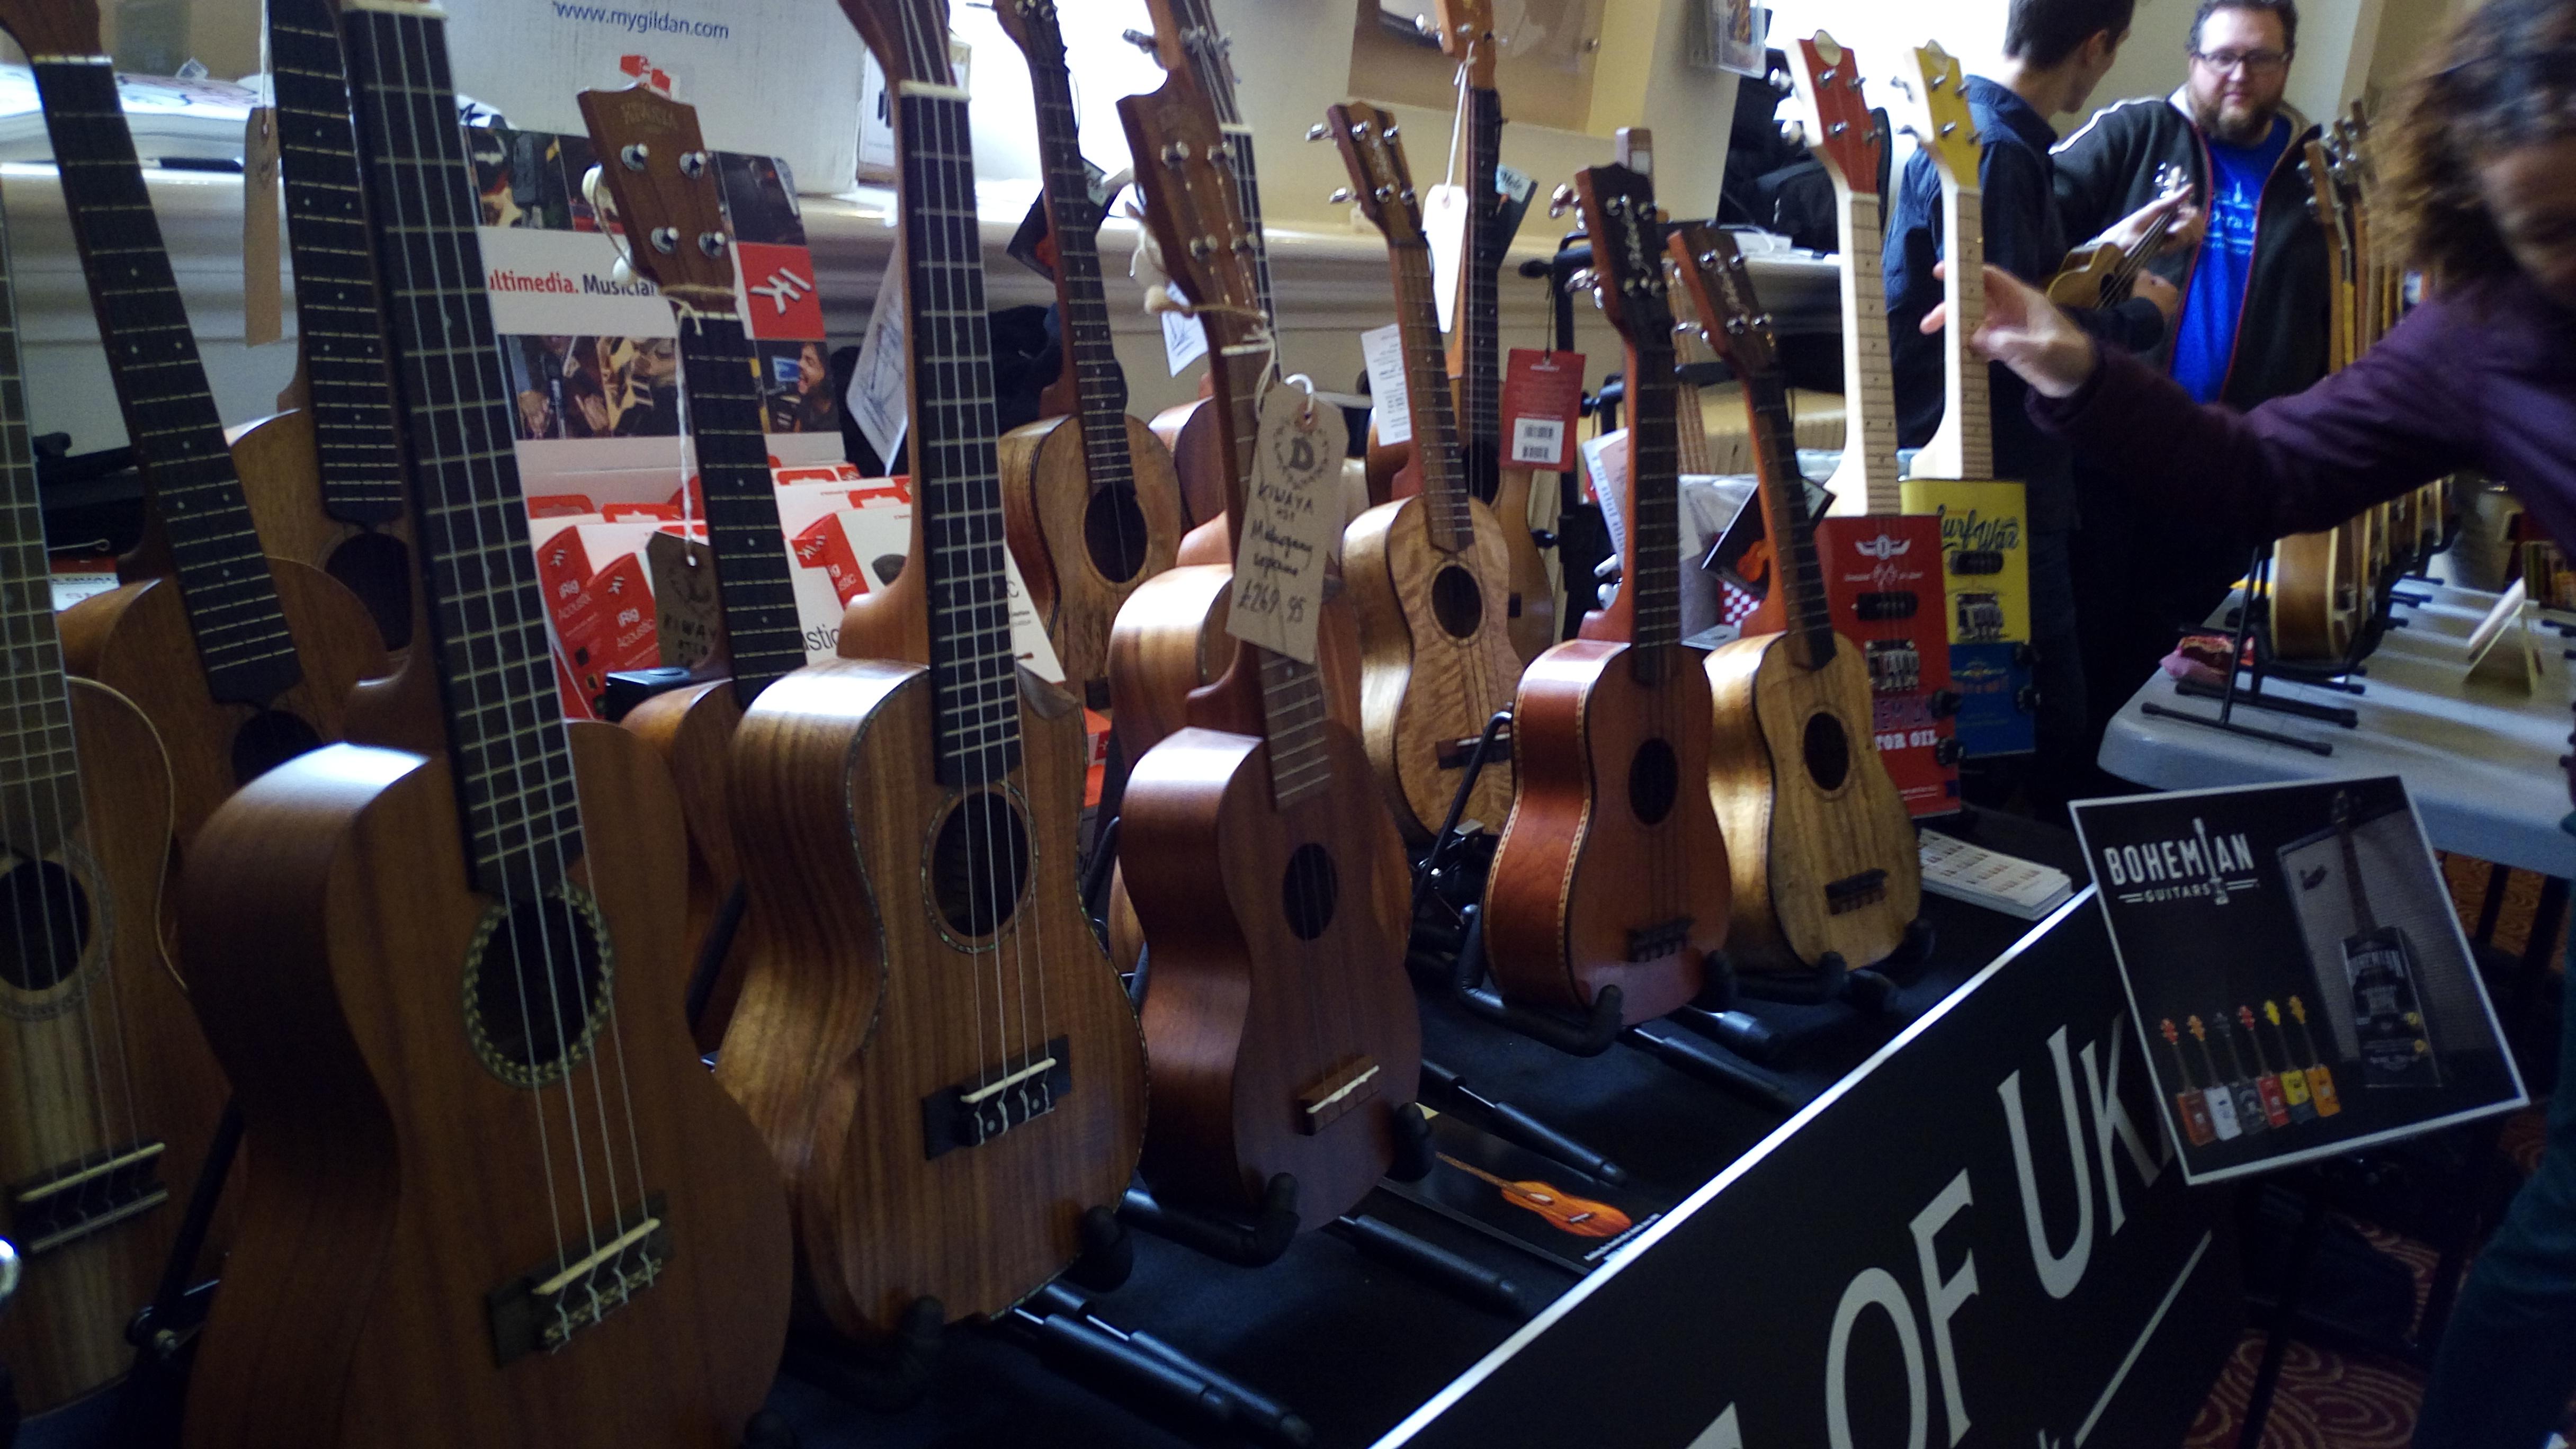 Hull ukulele group see here httpadukesmembersukulele acquisition syndrome hexwebz Gallery